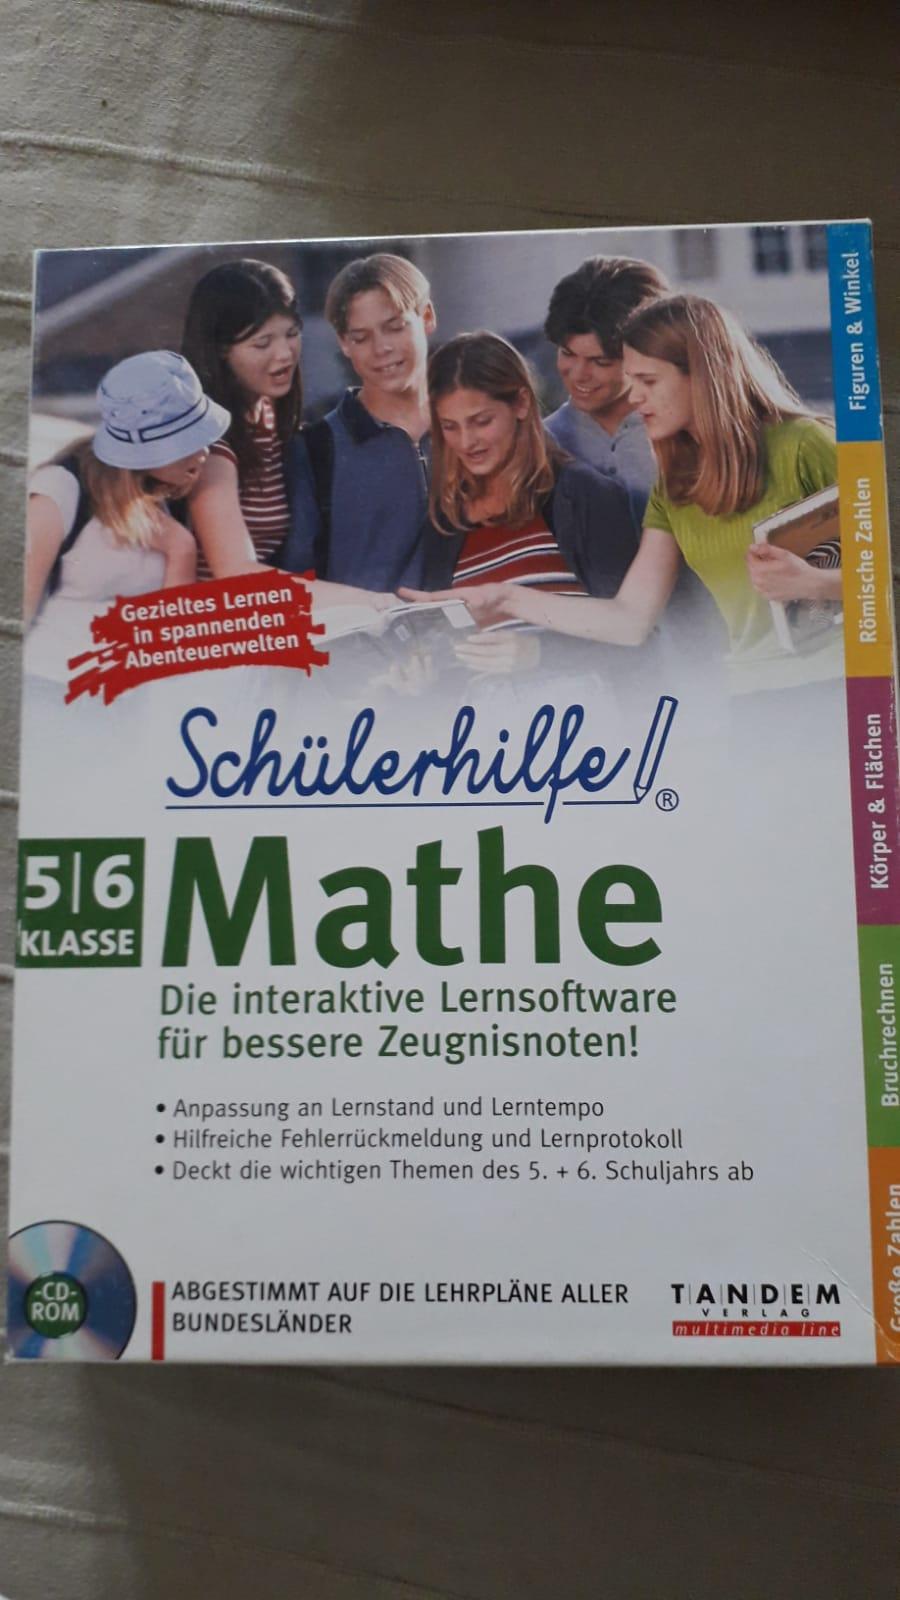 Mathe Lernsoftware tauschen